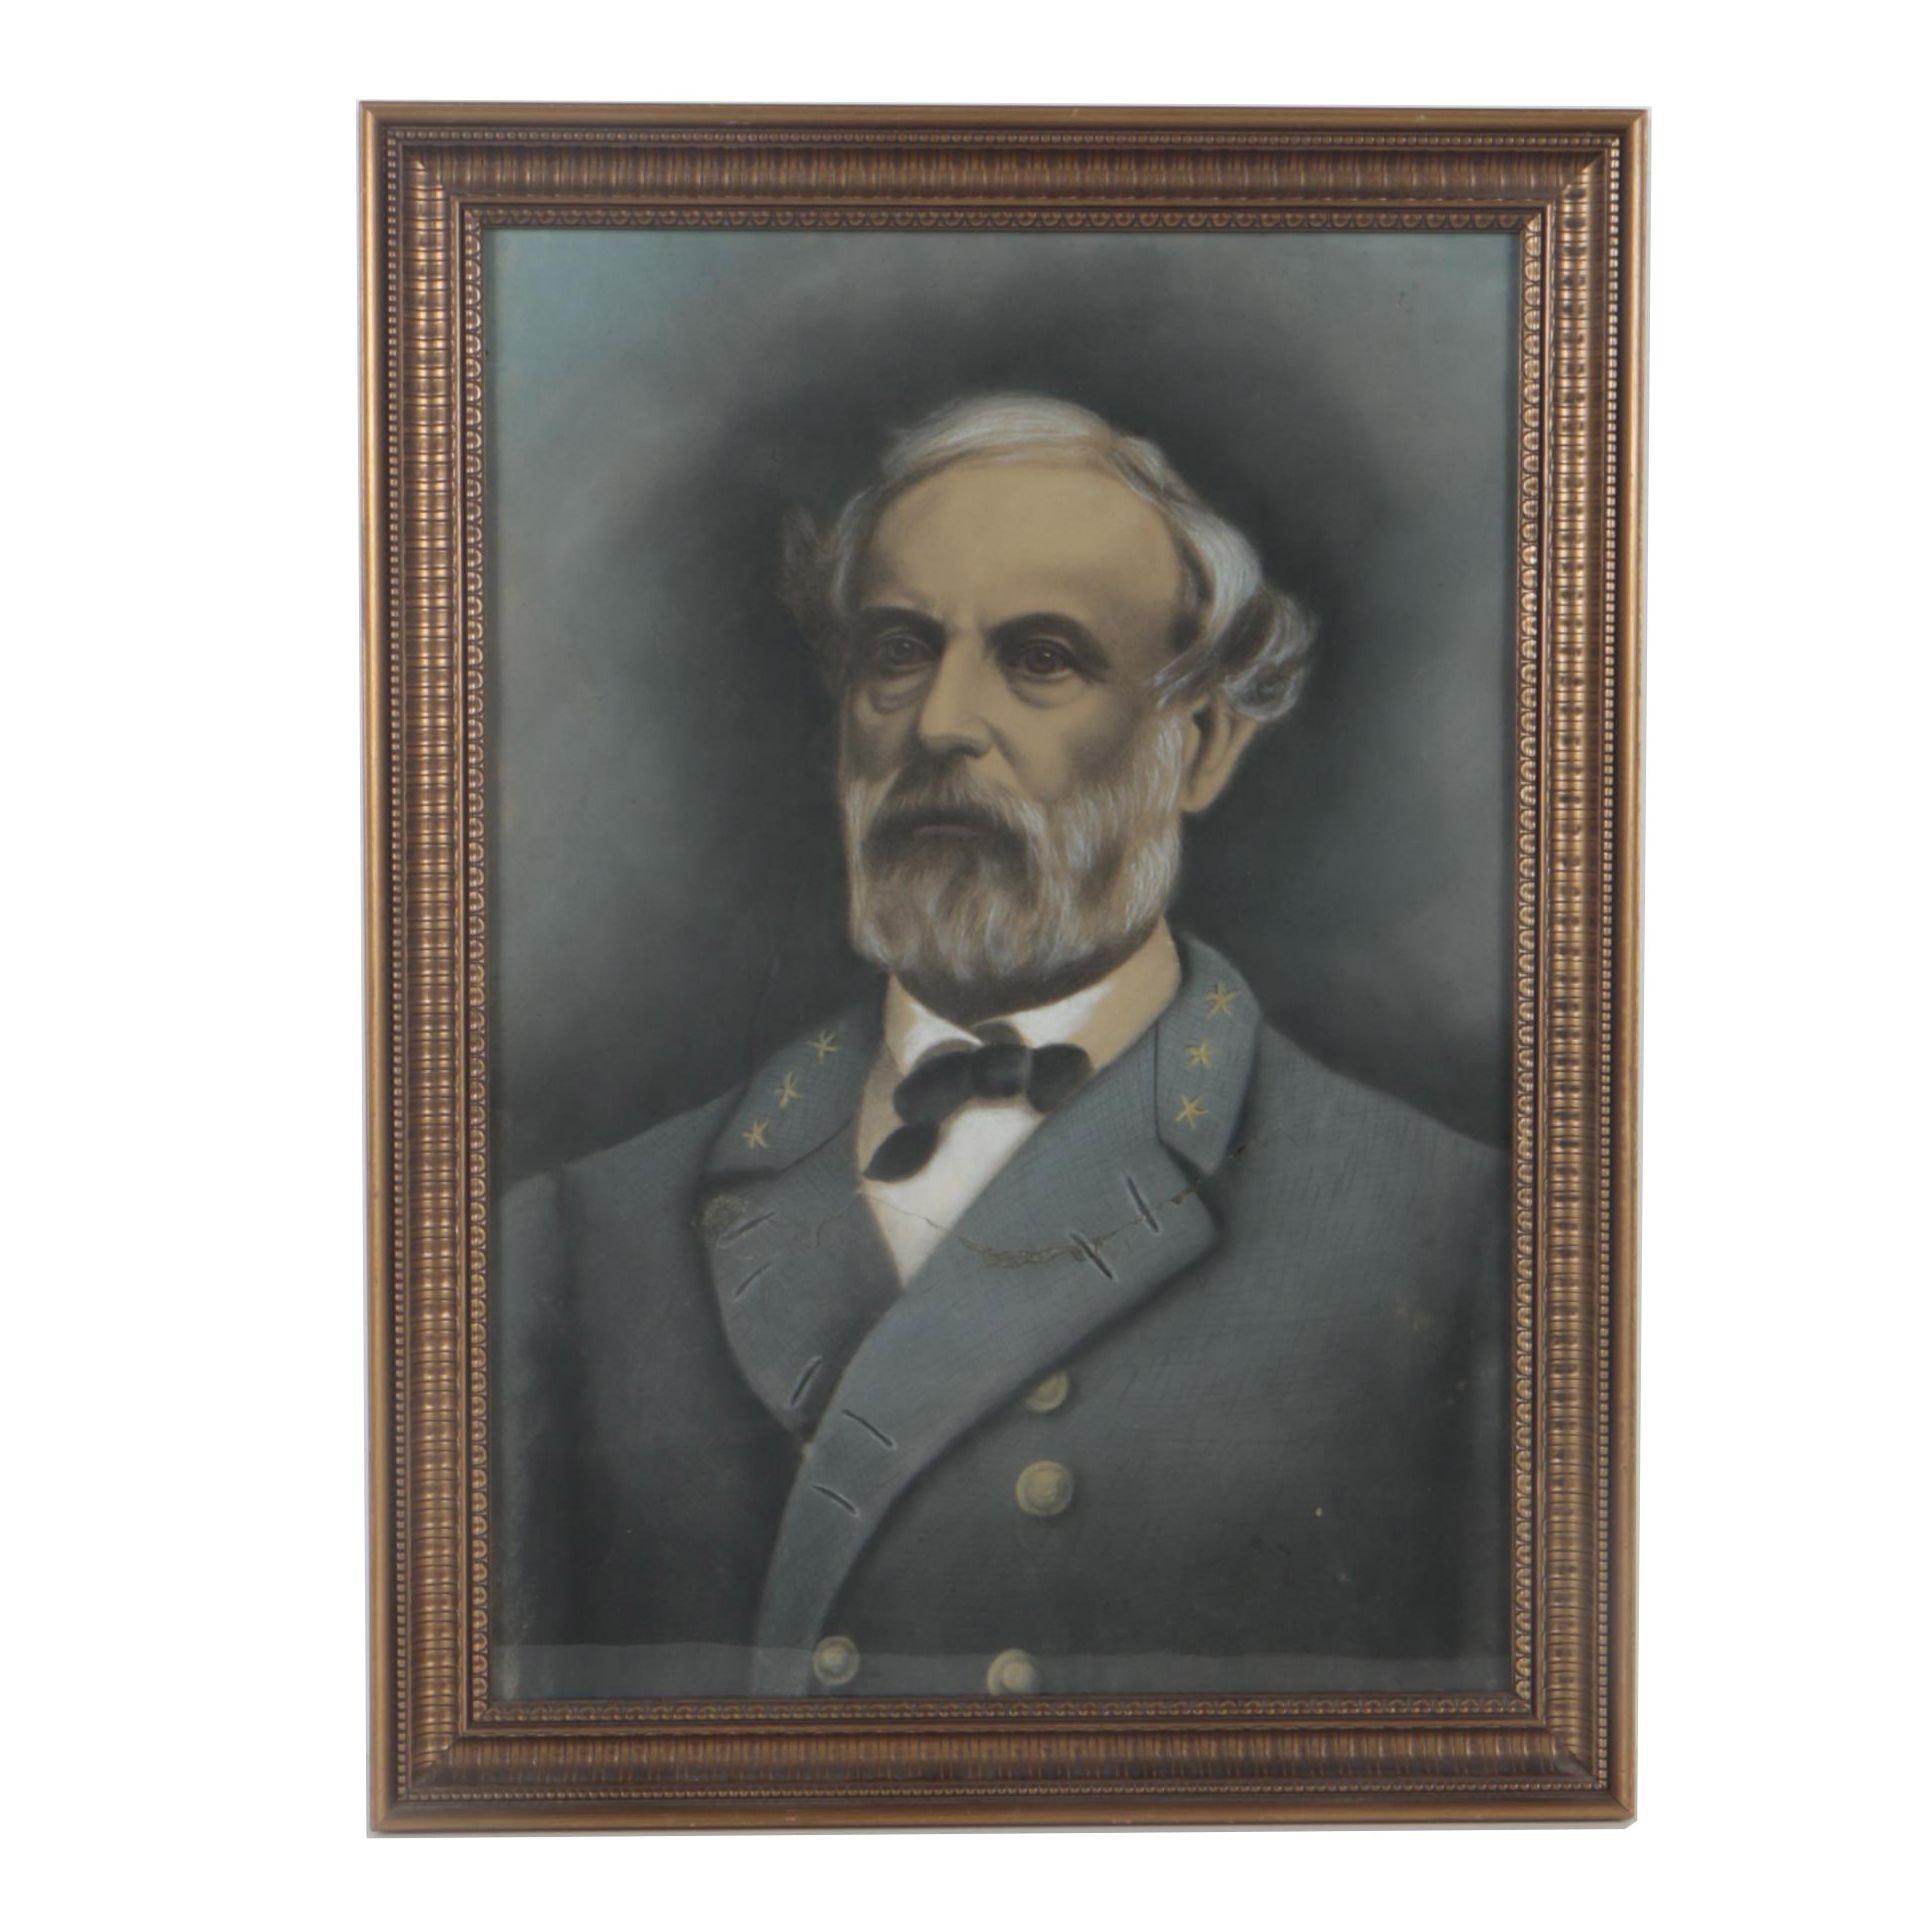 Crayon Portrait of Robert E. Lee